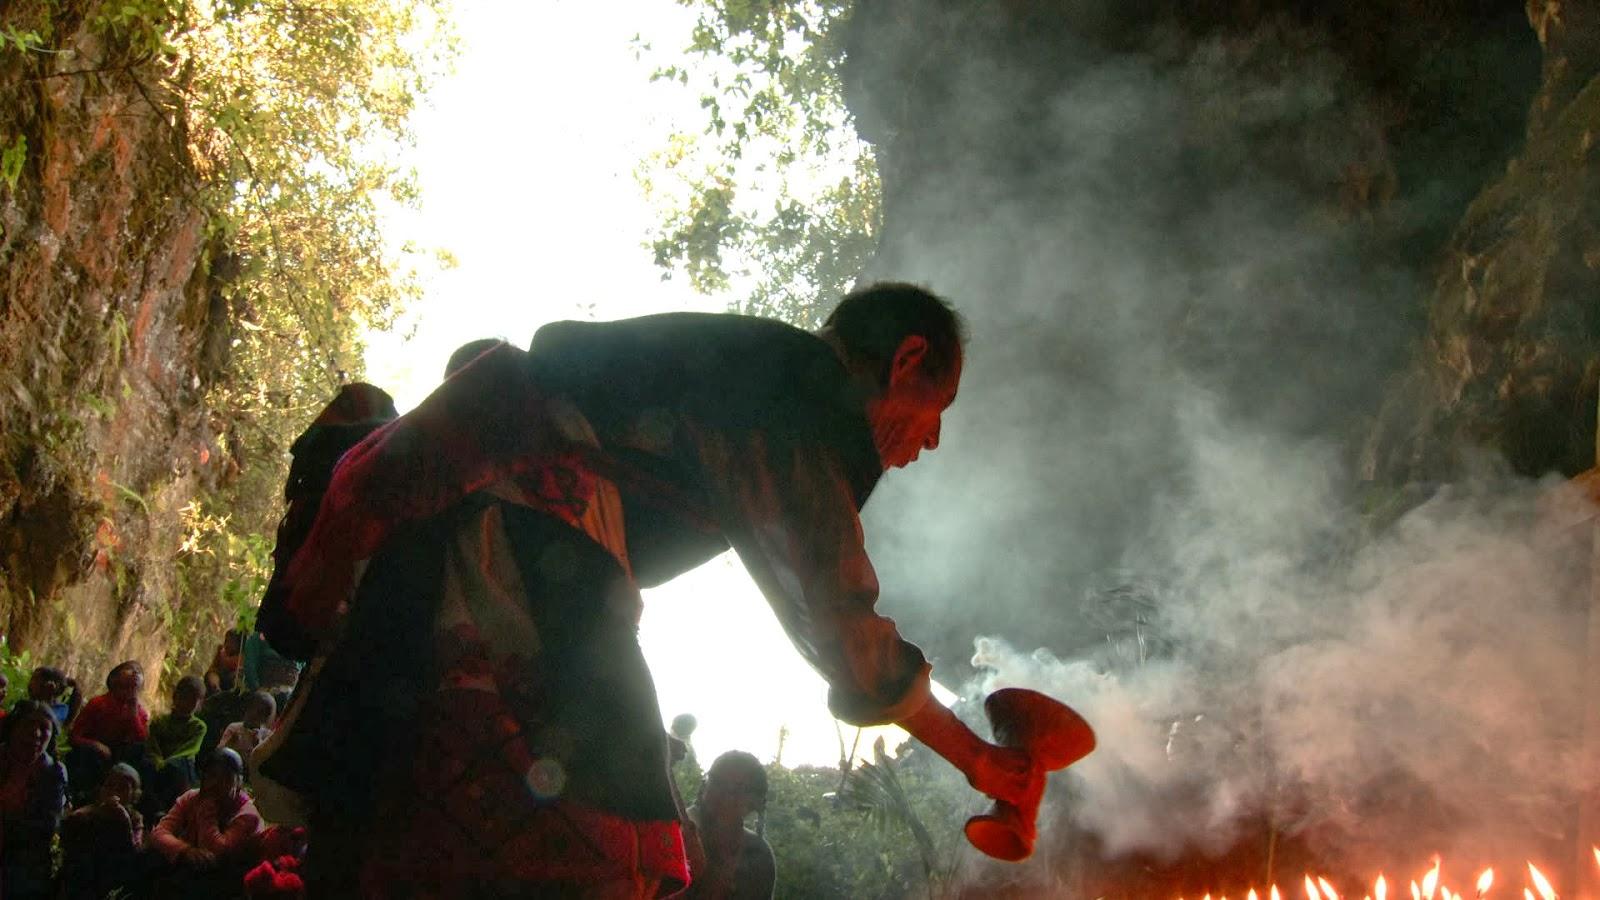 himmelssäng ellos ~ chacatorex 20131215